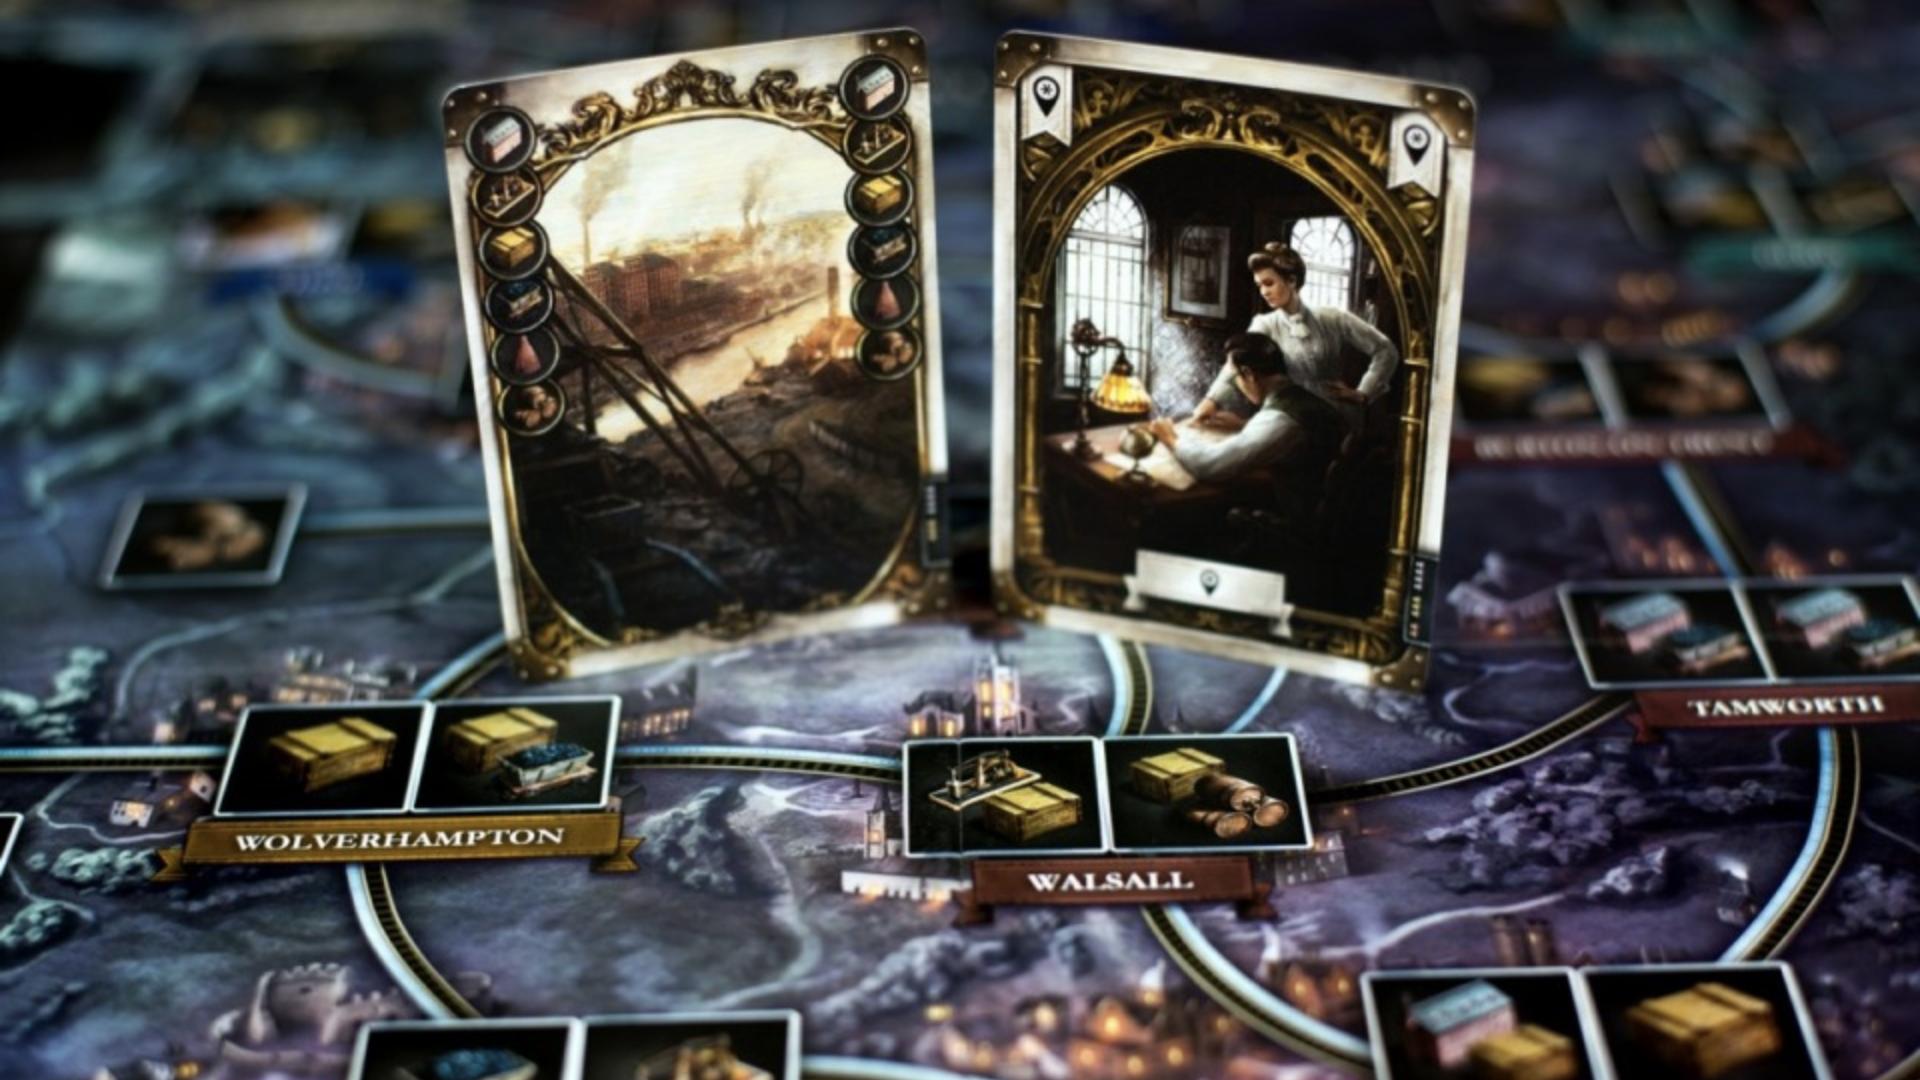 Brass: Birmingham board game layout 2